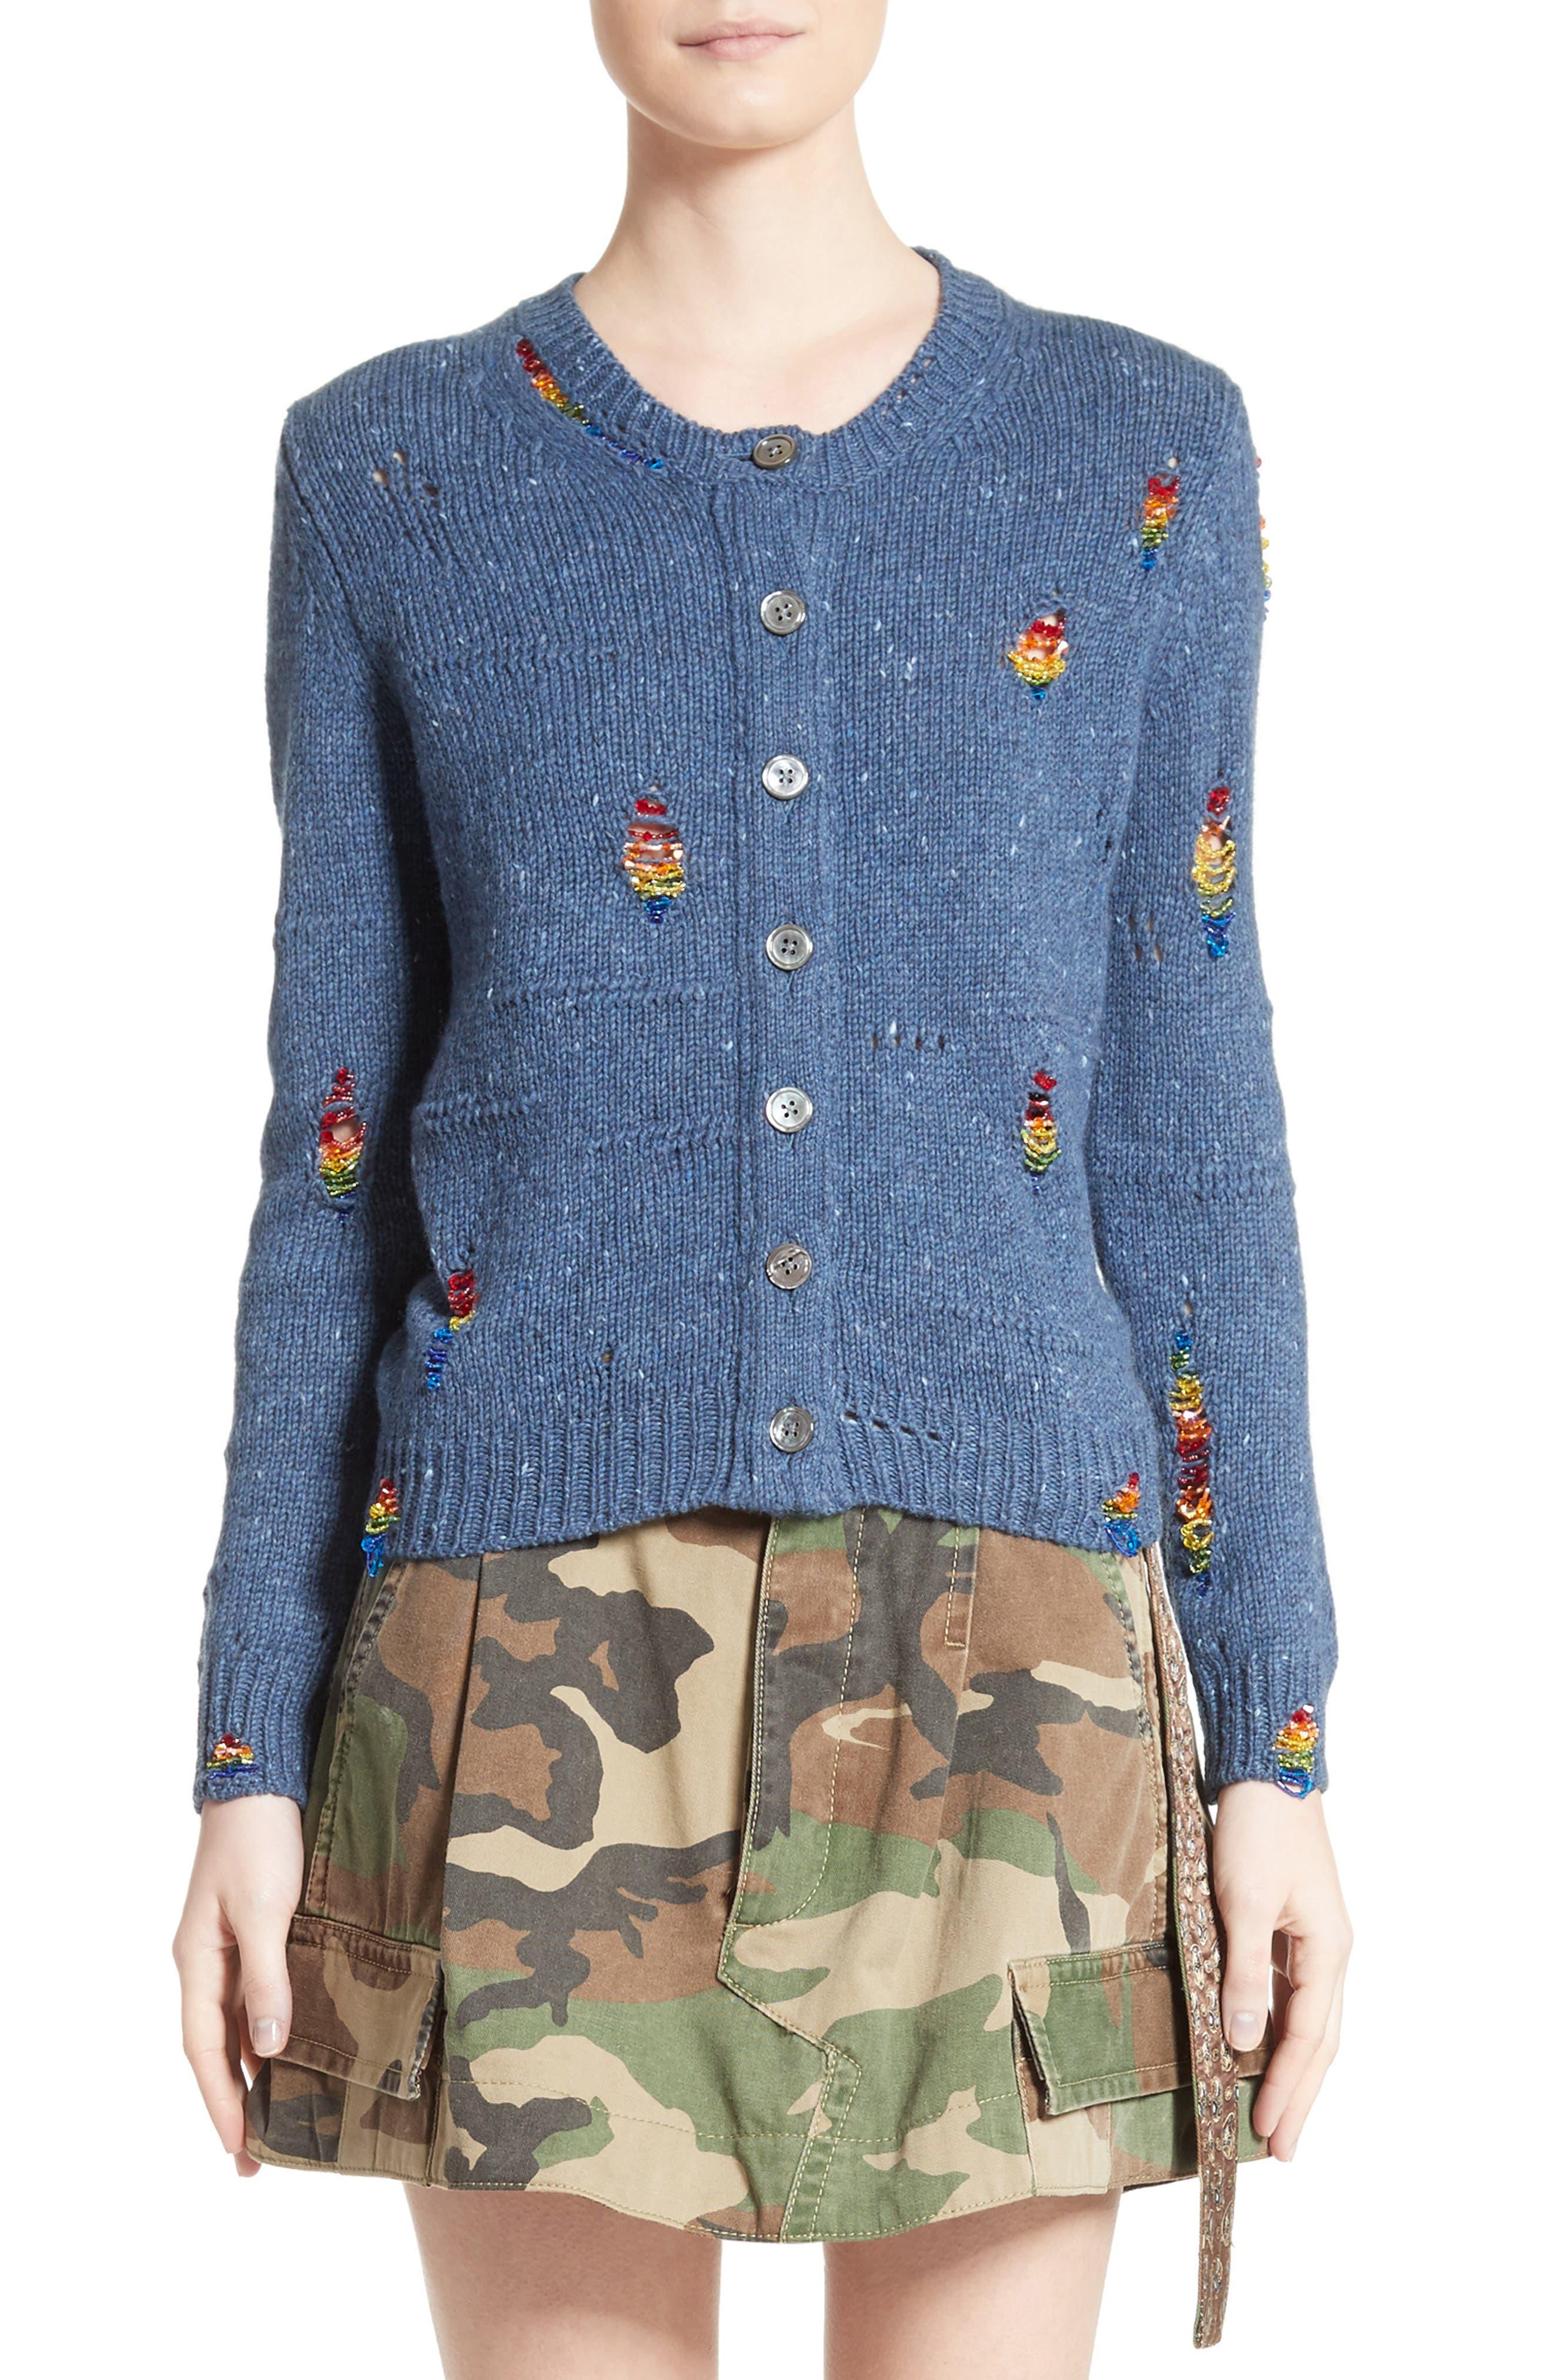 MARC JACOBS Embellished Knit Cardigan